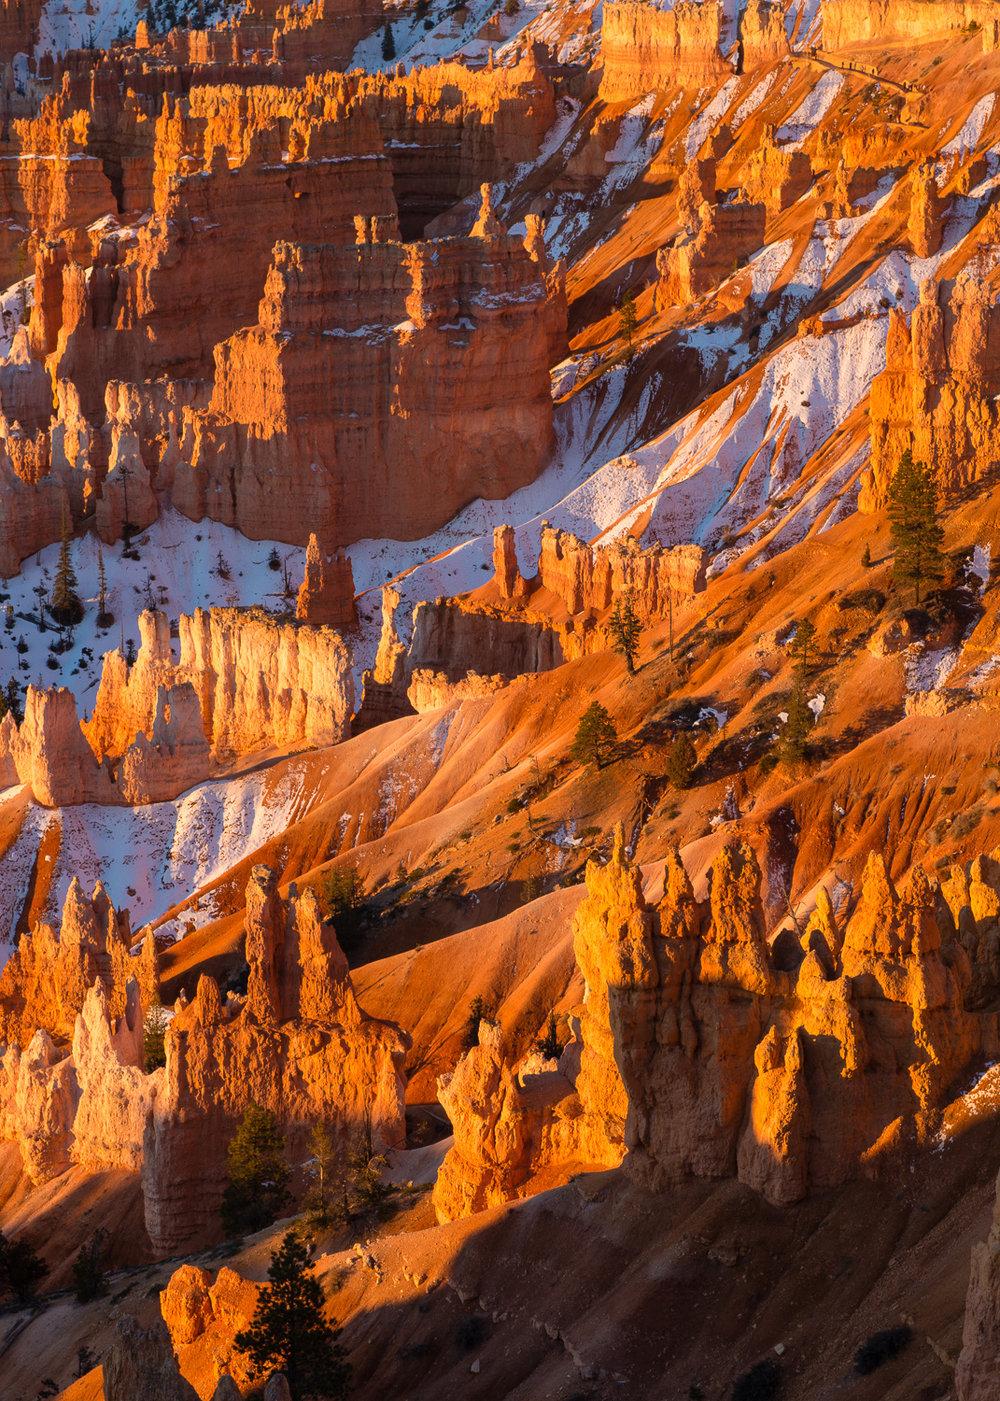 Hoodoos in Canyons, Bryce Canyon